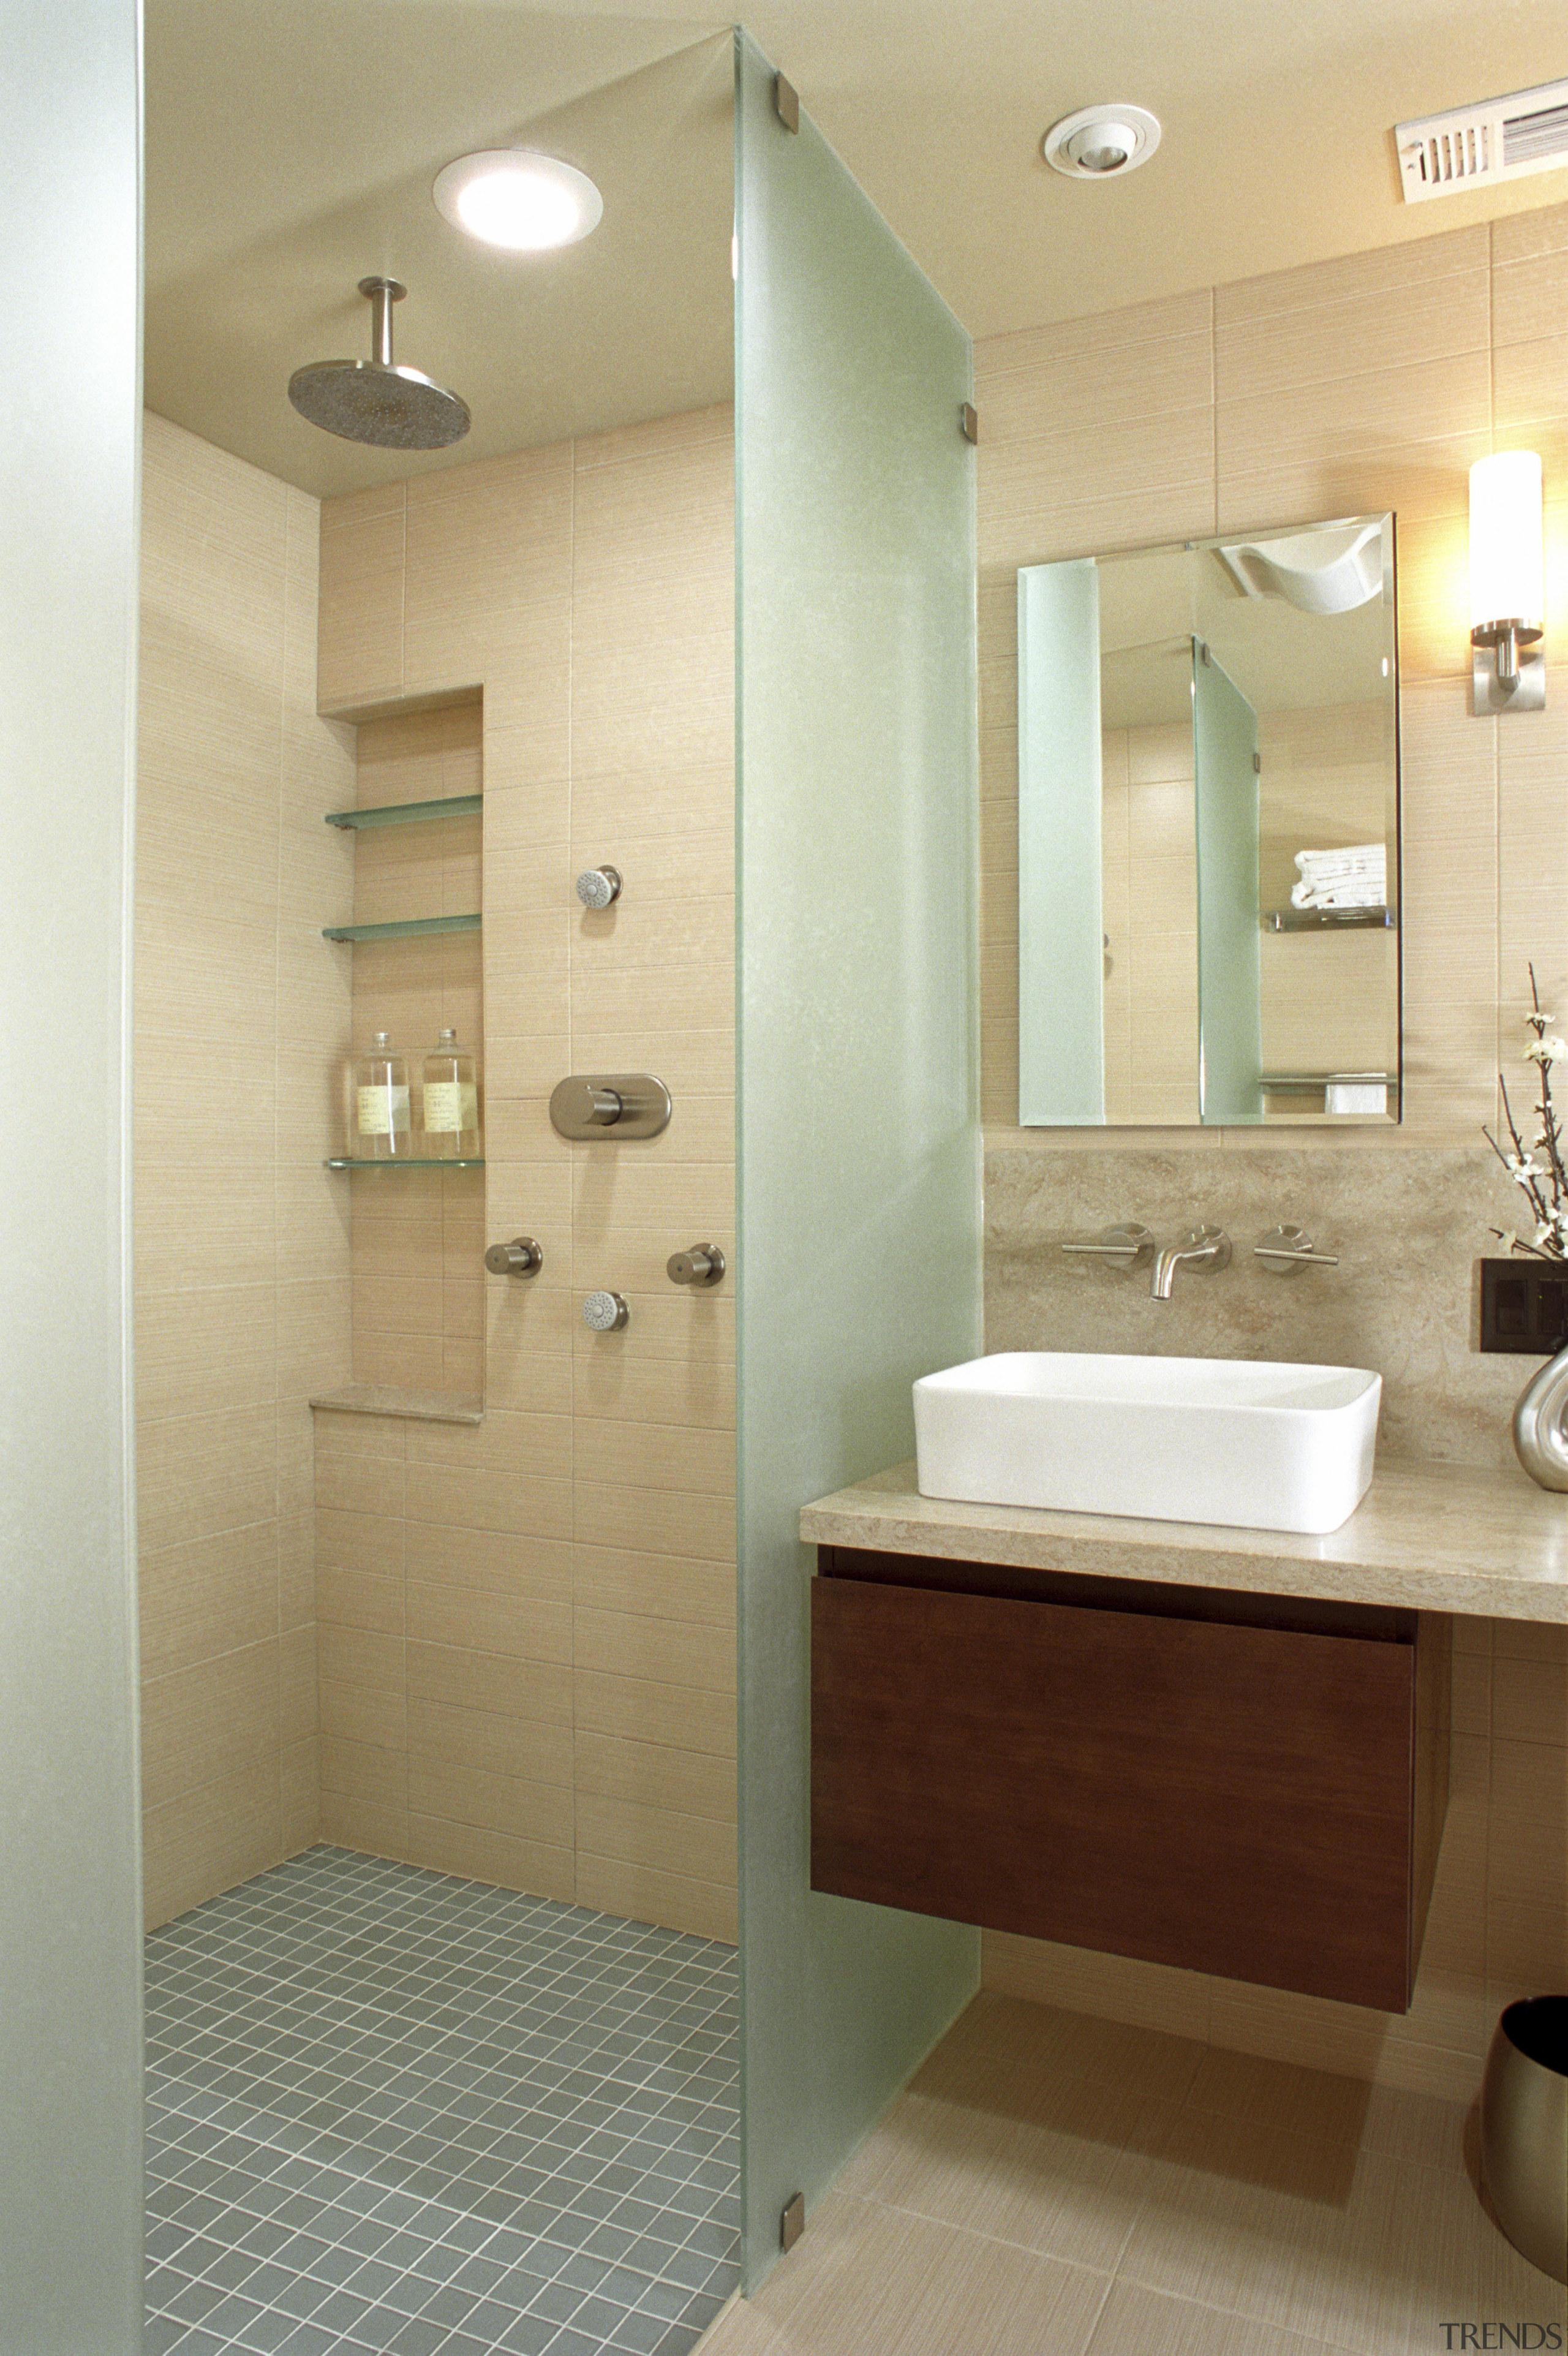 A view of some bathroom ware from NKBA. bathroom, bathroom accessory, bathroom cabinet, floor, home, interior design, plumbing fixture, room, sink, orange